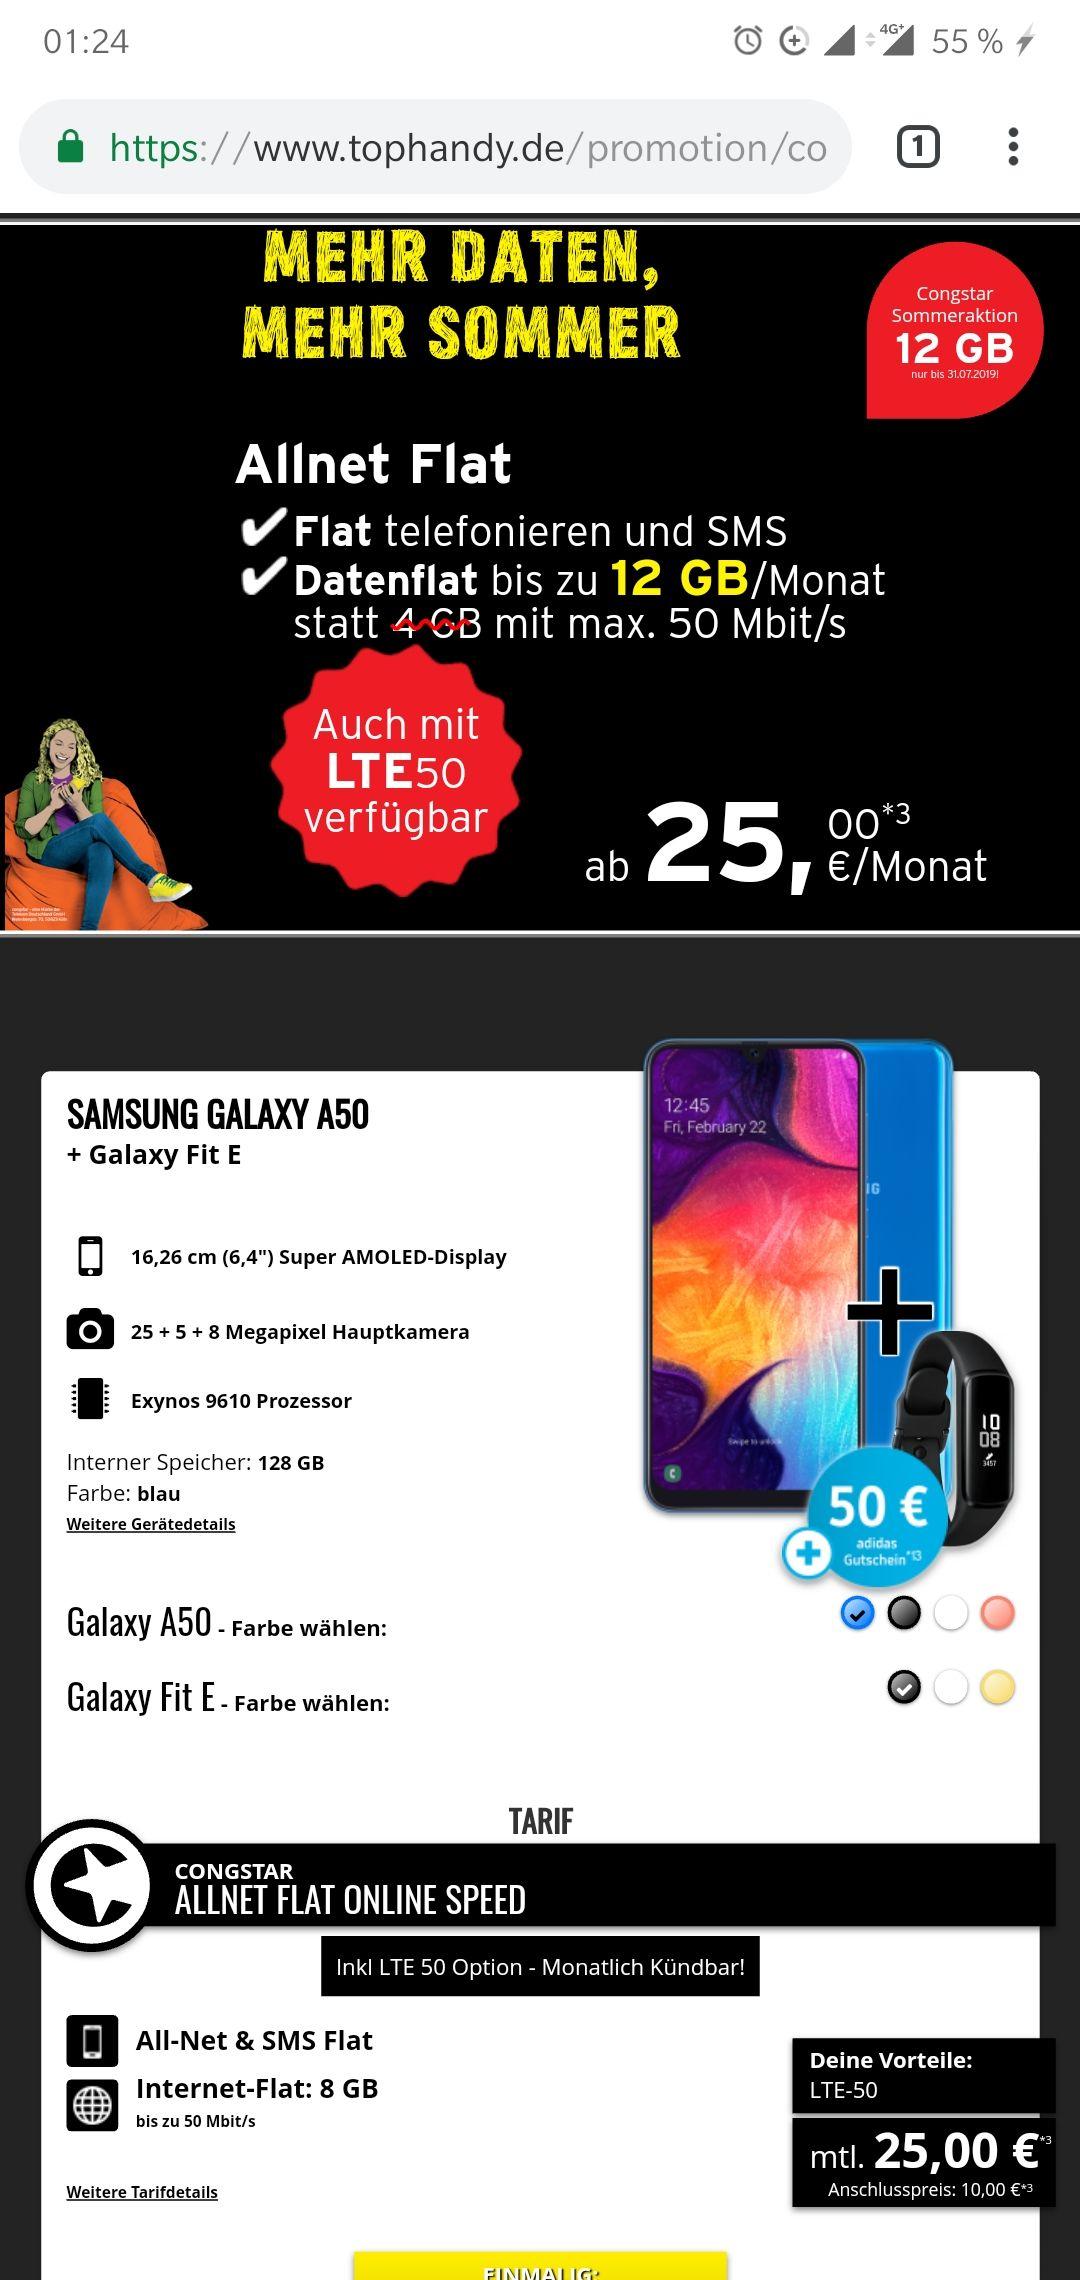 Congstar Allnet-Flat inkl SMS-Flat mit 8 GB LTE für monatl. 25 Euro plus Samsung Galaxy A50 + Samsung Fit E Band + Adidas 50 Euro Gutschein